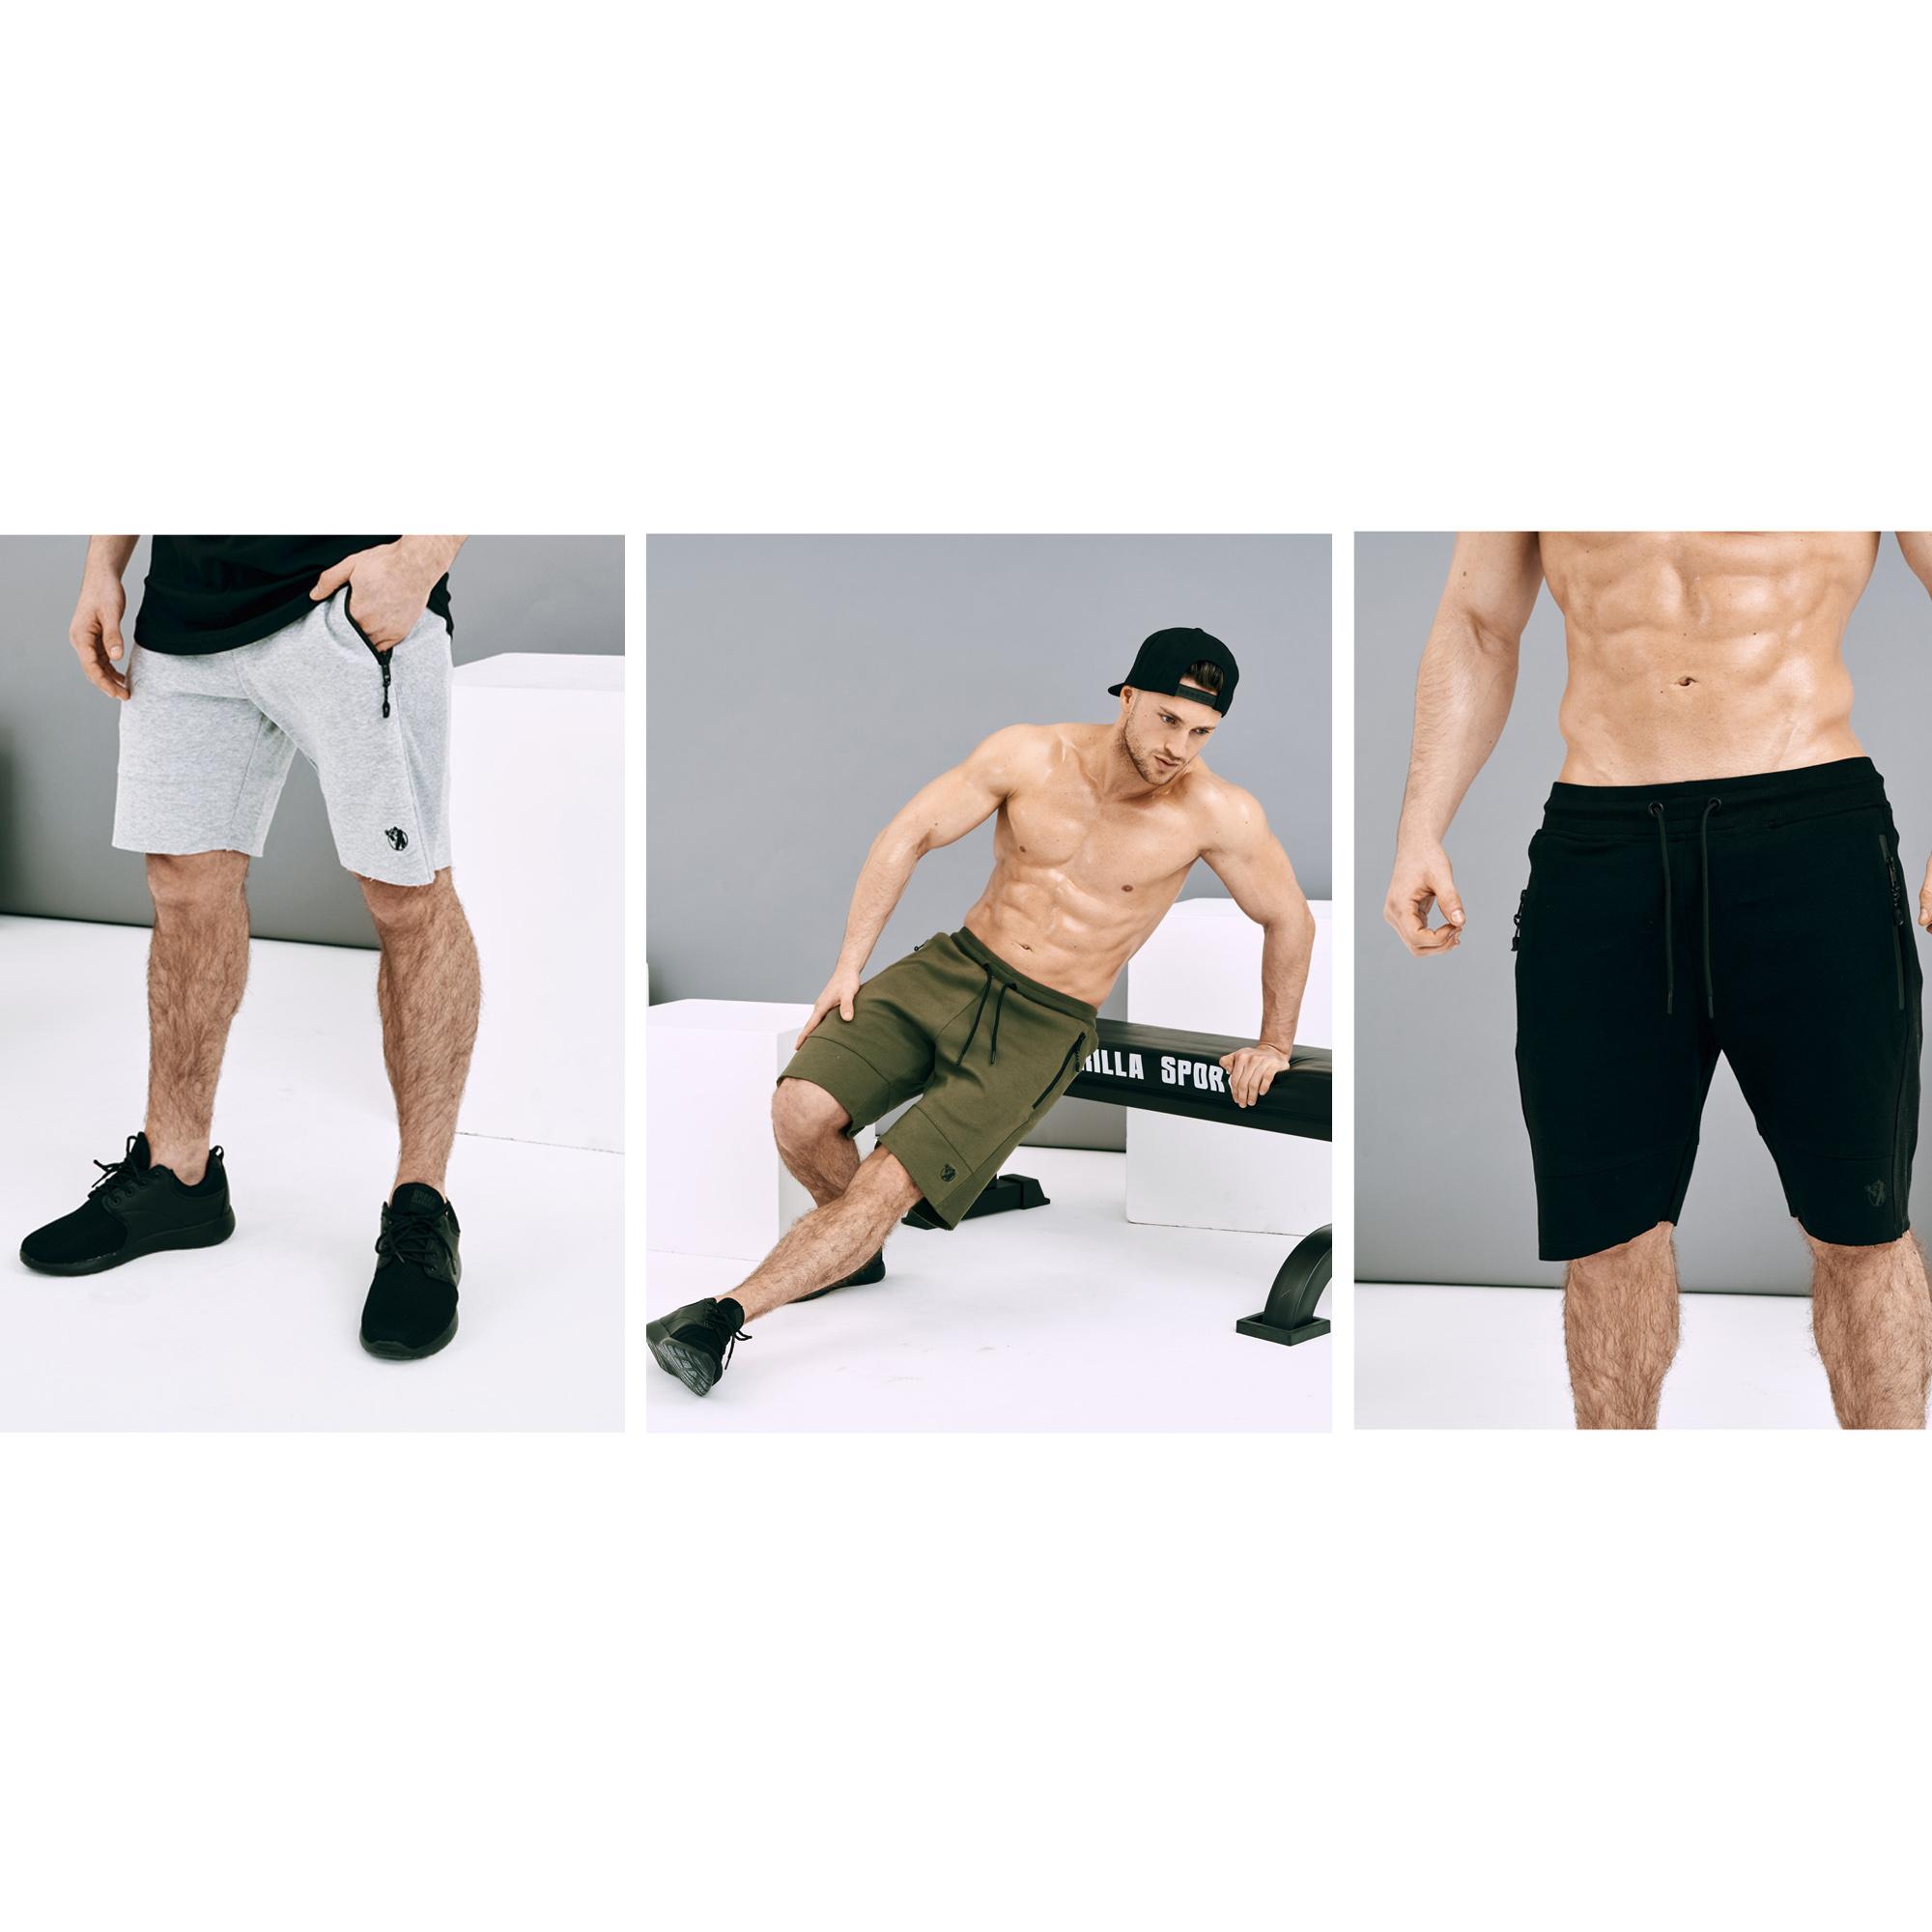 Shorts Sport in Grau/Schwarz/Olive